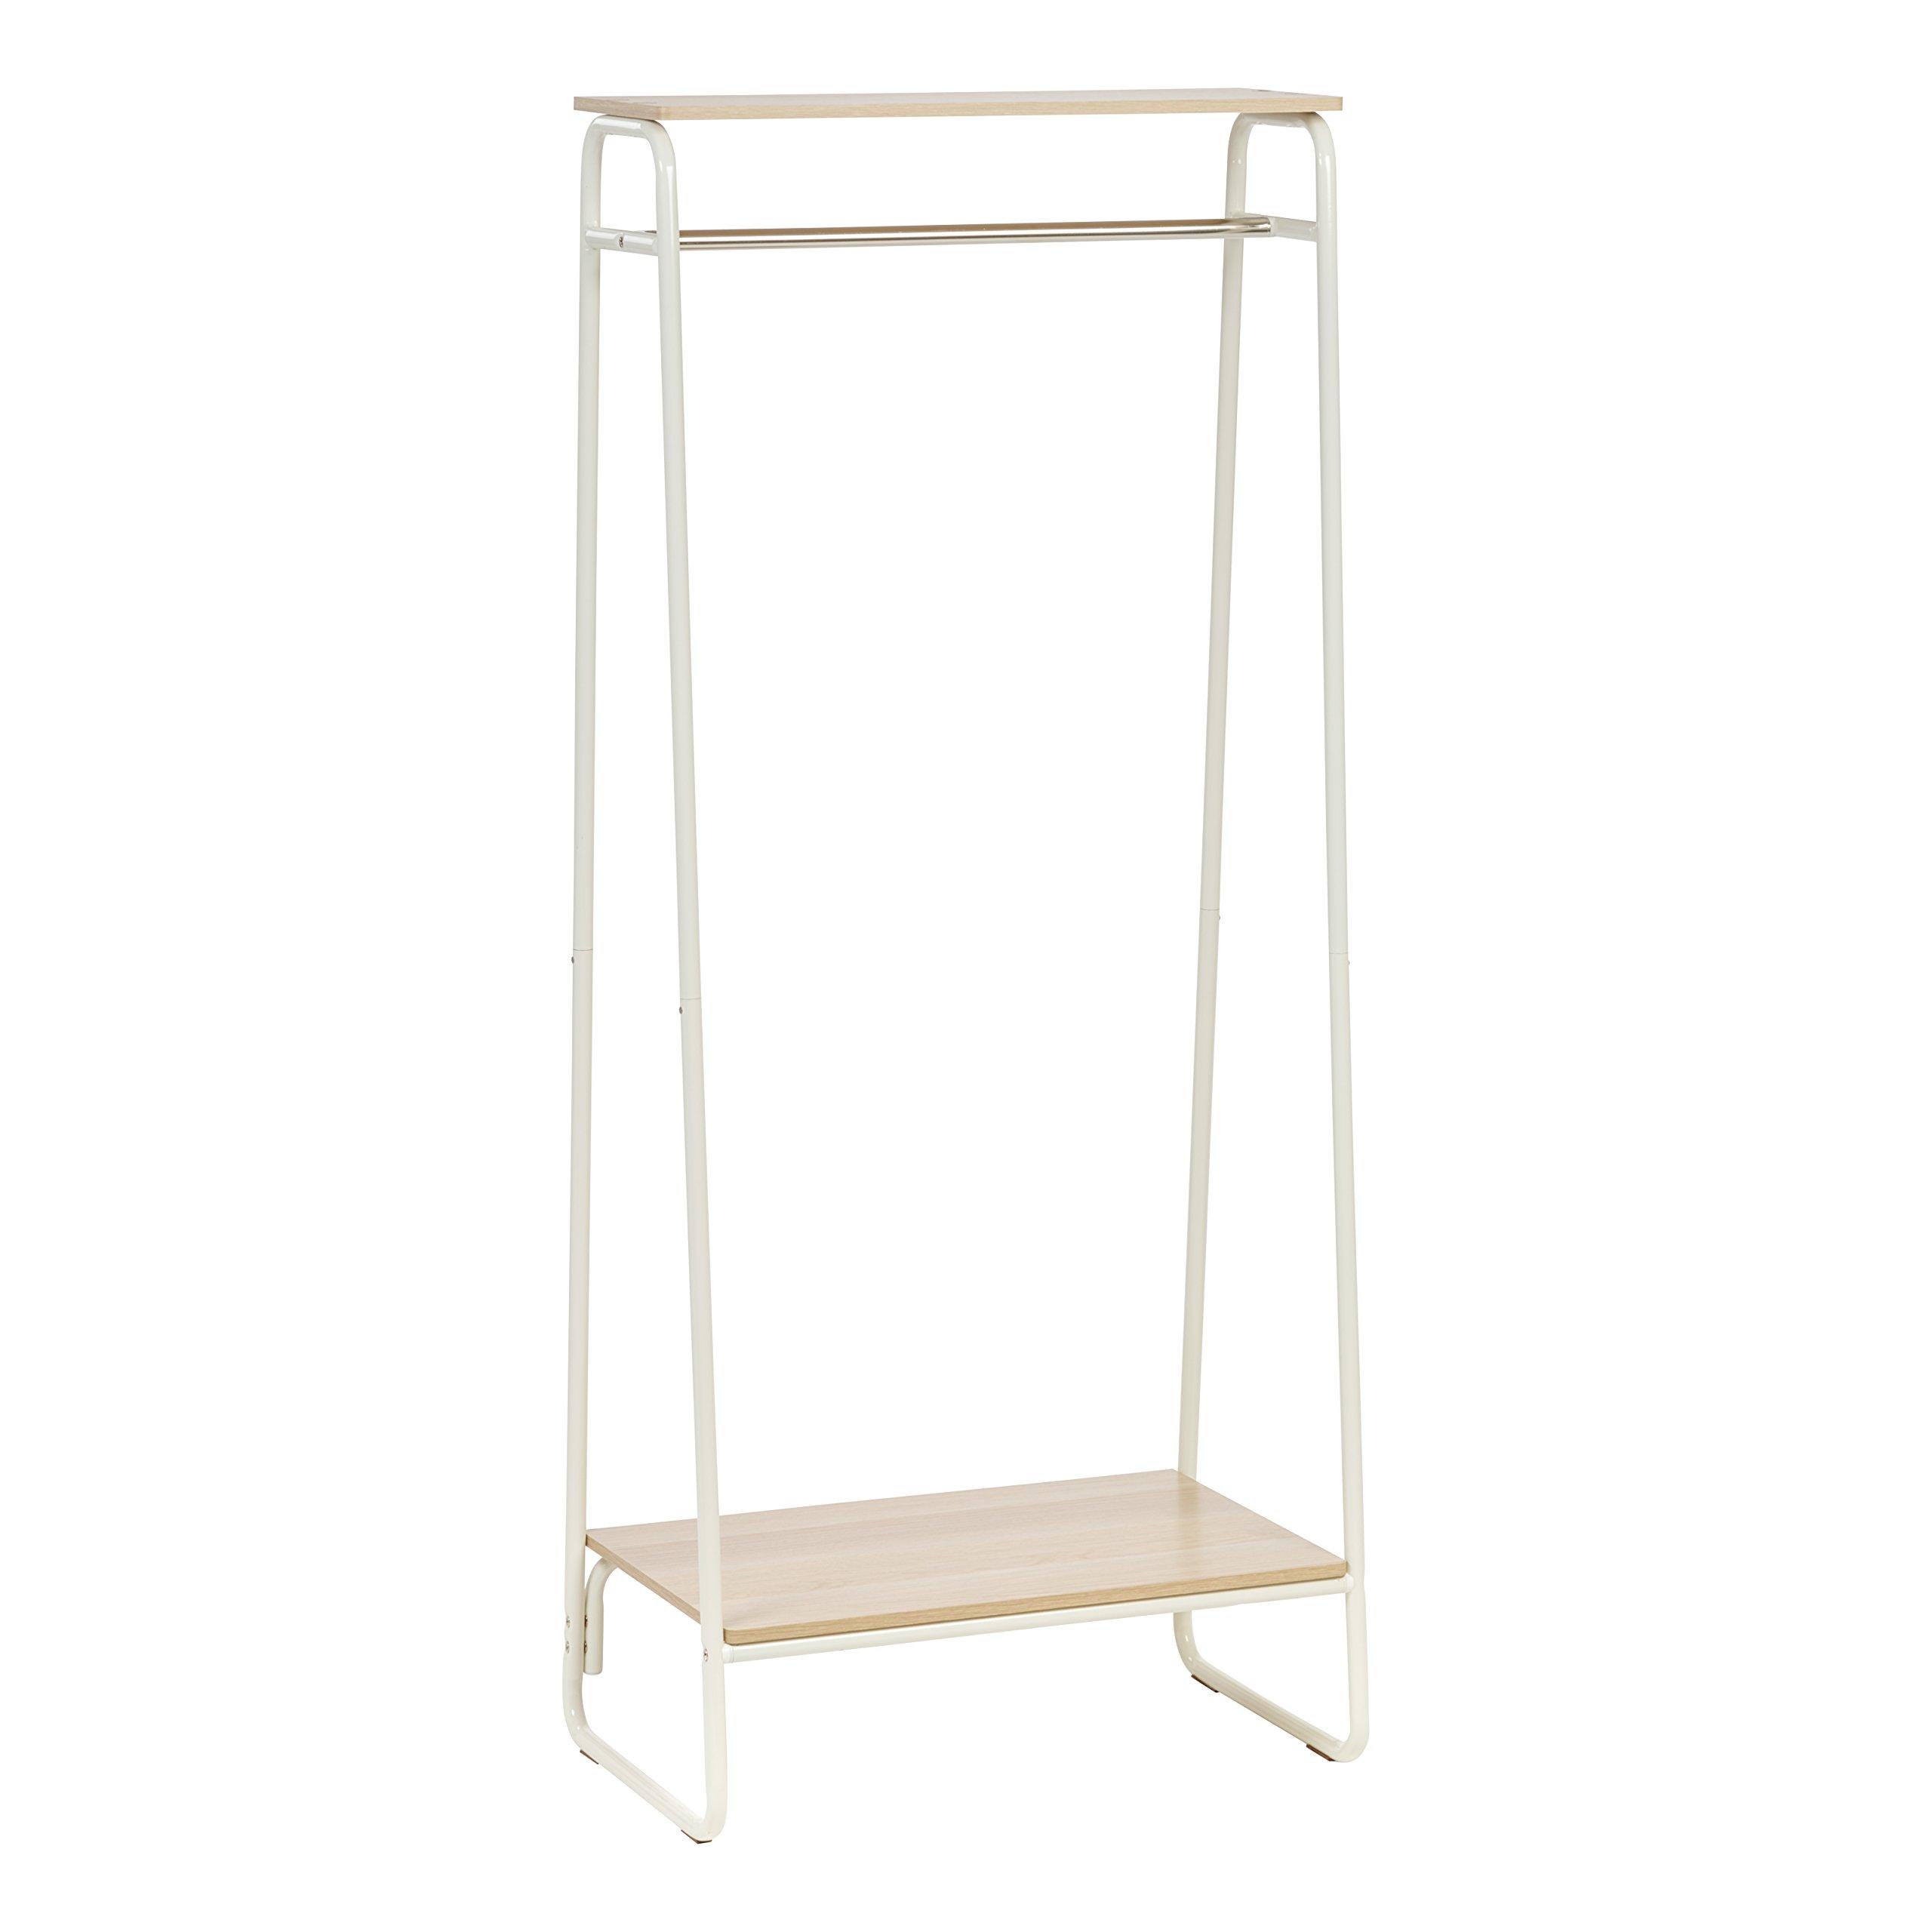 IRIS Metal Garment Rack with 2 Wood Shelves, White and Light Brown by IRIS USA, Inc. (Image #1)